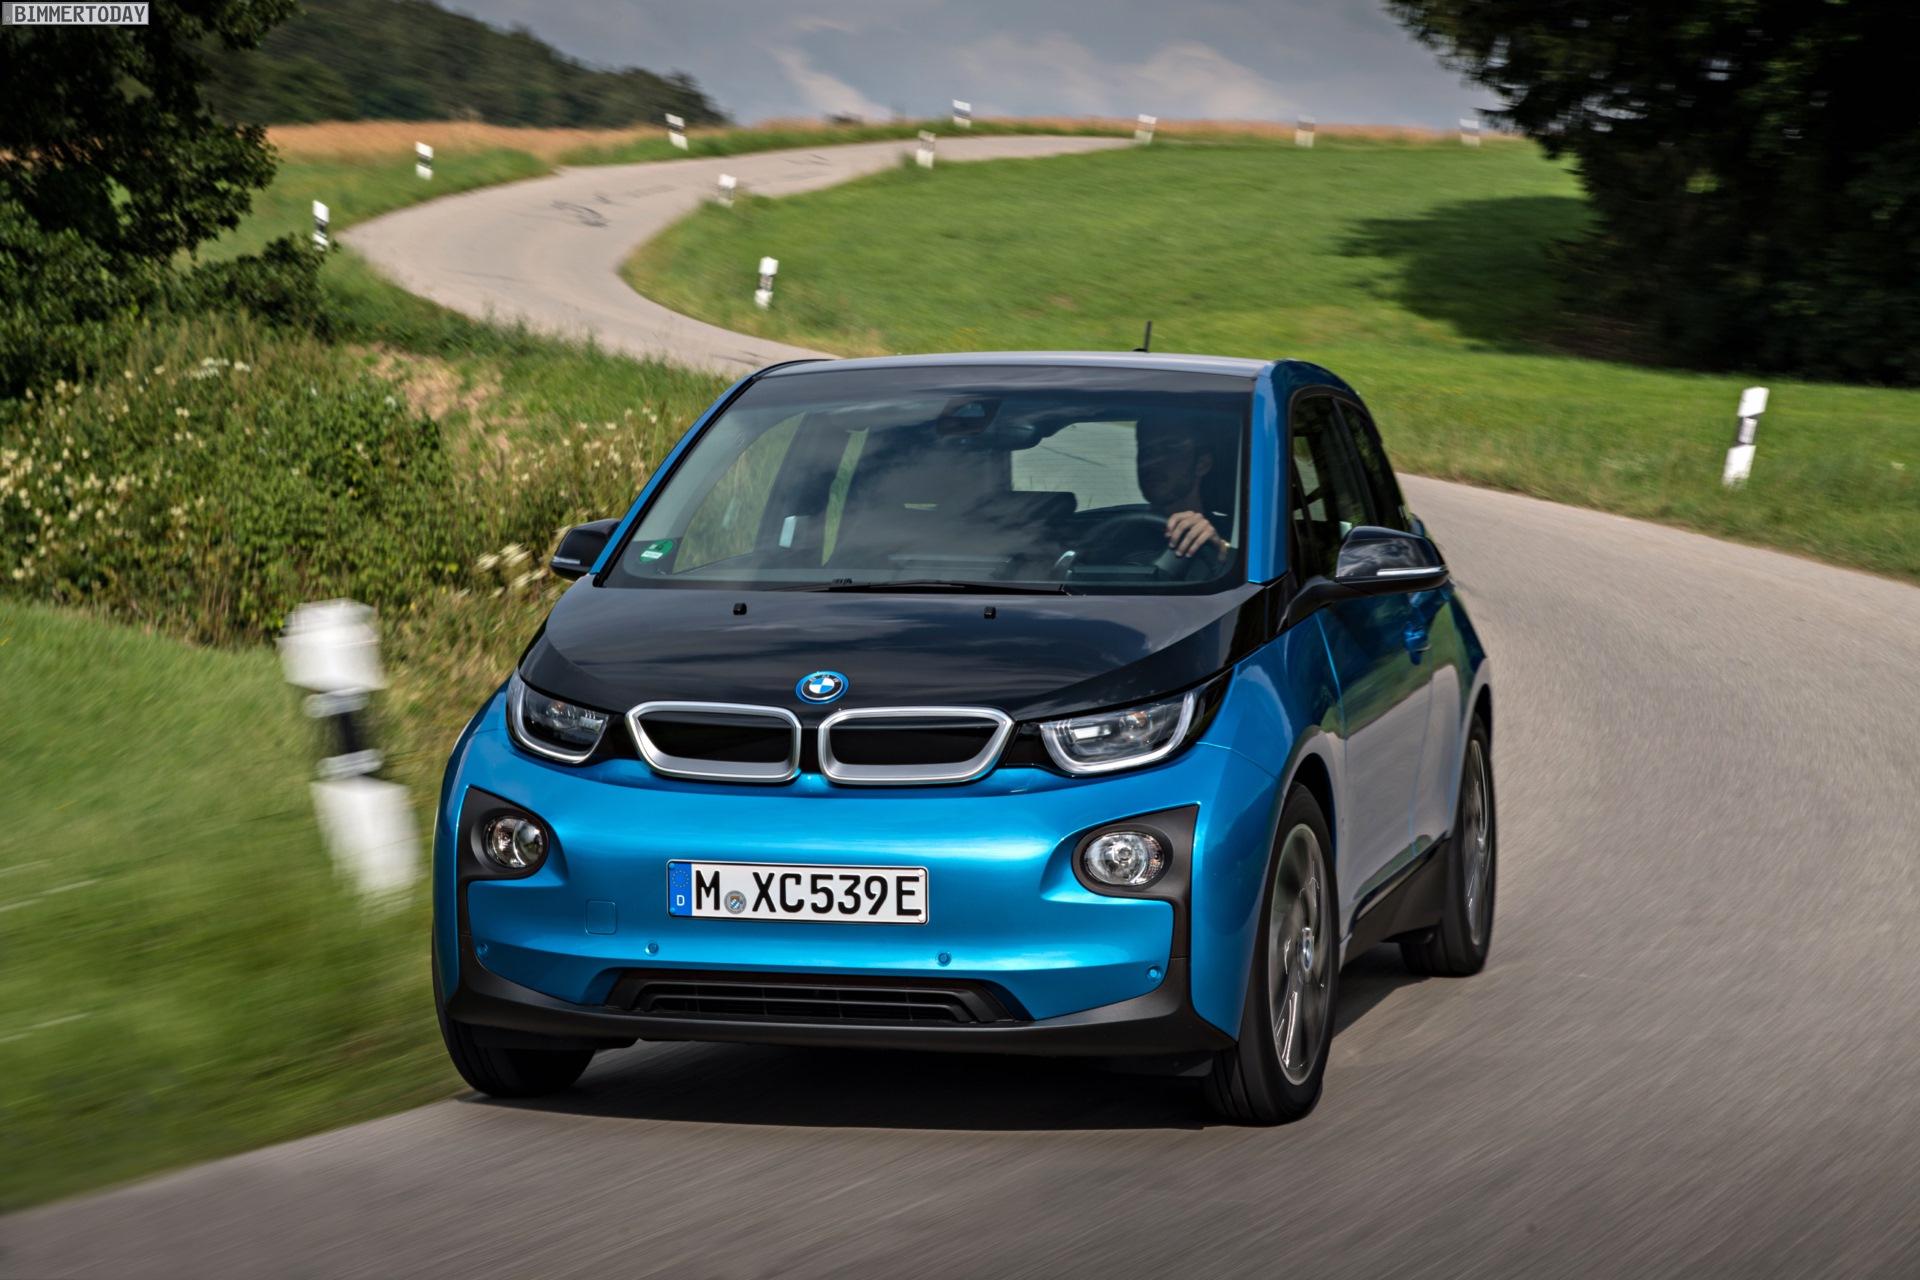 2016 BMW i3 94Ah Protonic Blue 33 kWh Elektroauto 14